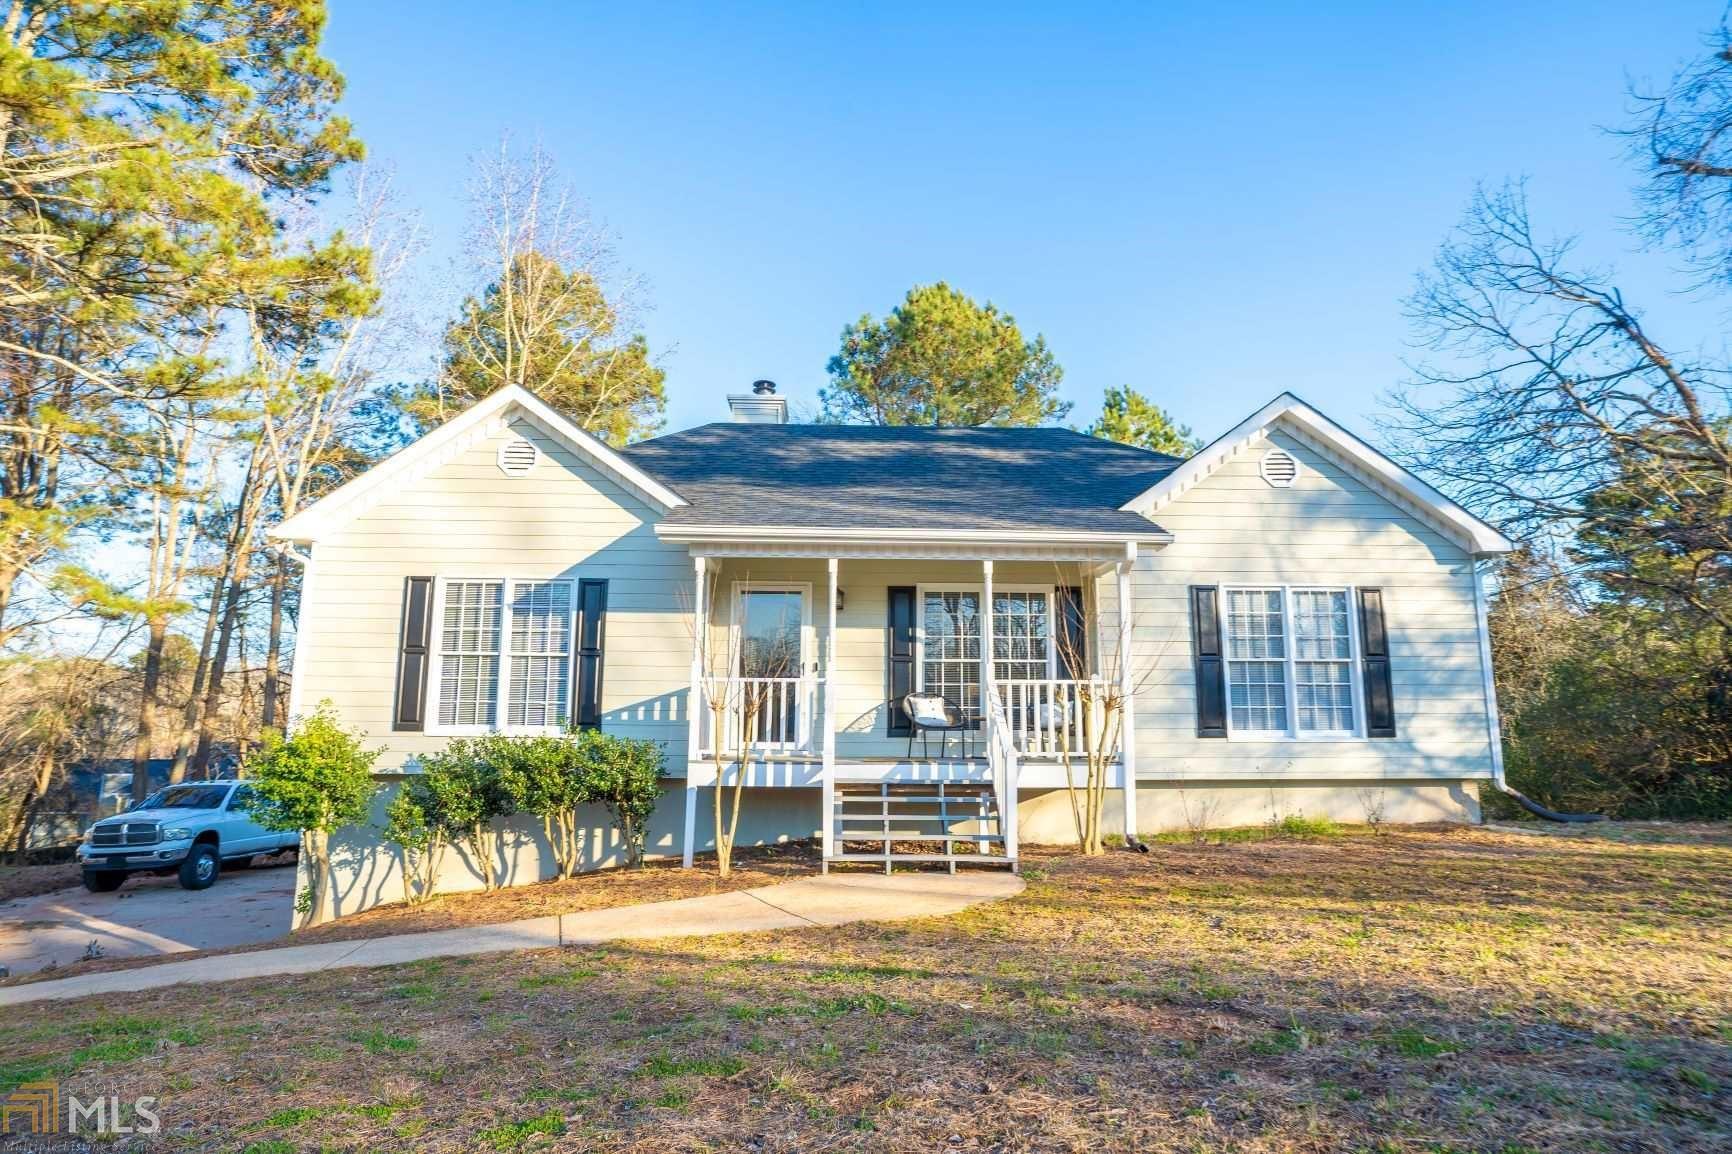 985 Woodvalley, Canton, GA 30115 - MLS#: 8935914